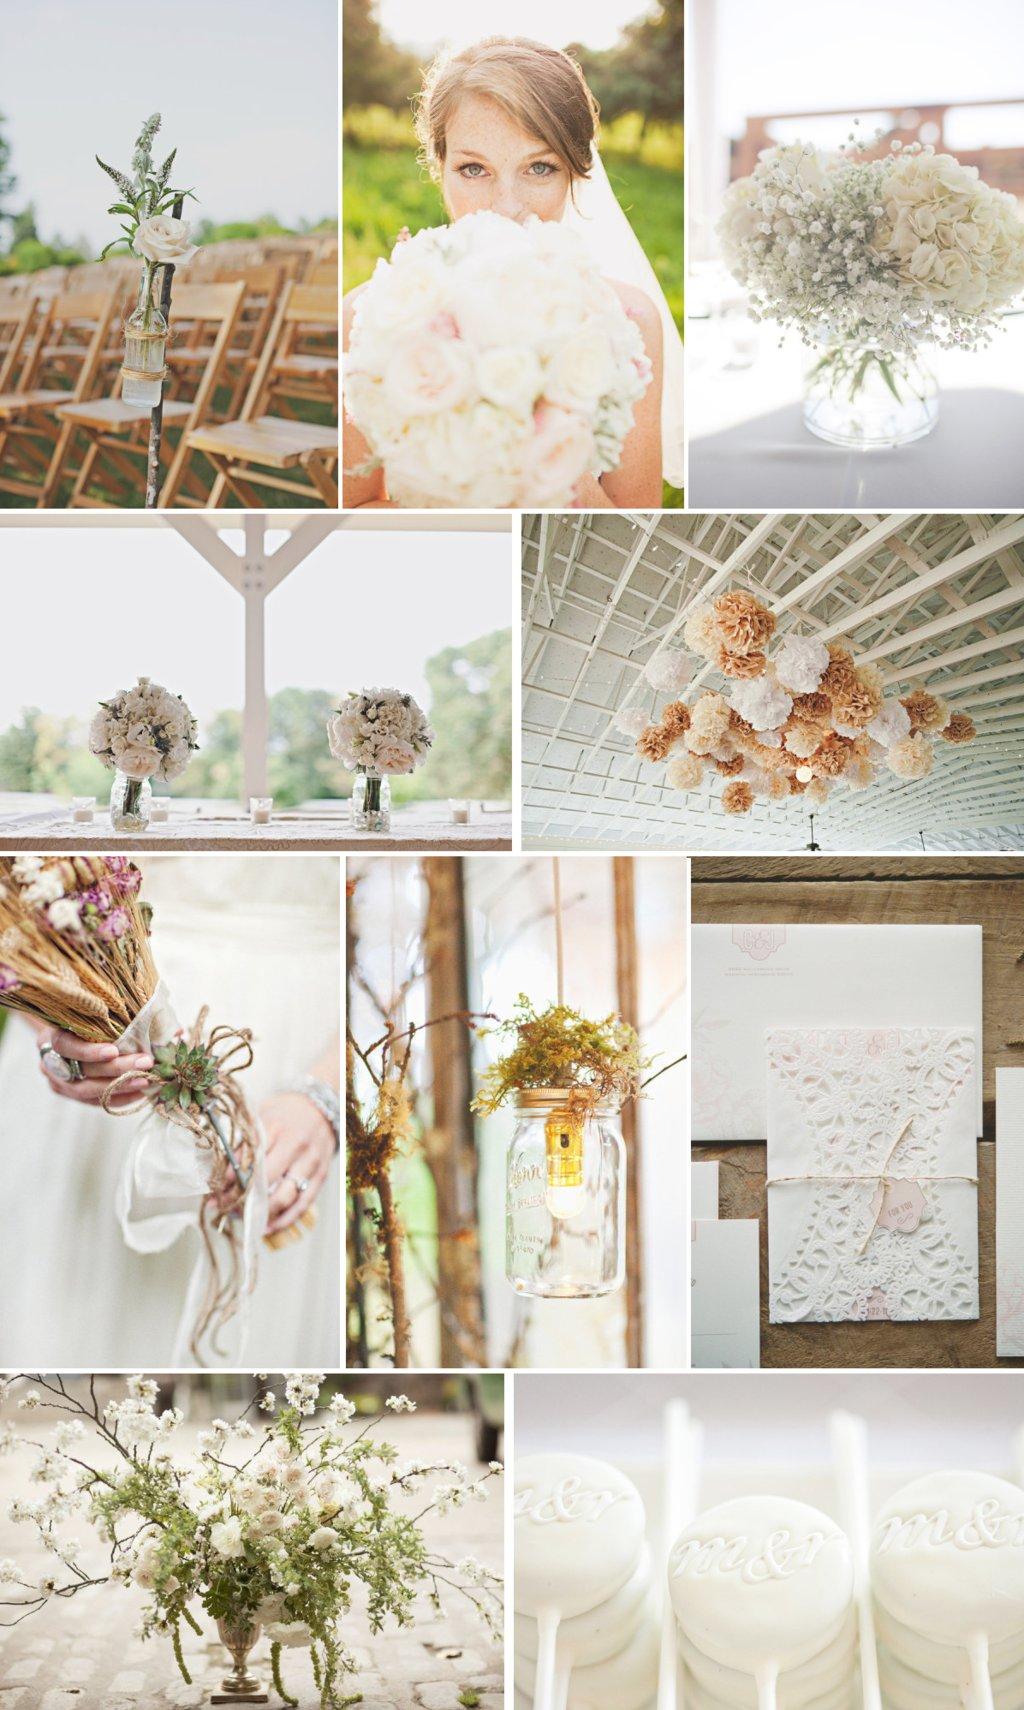 Neutral-wedding-color-inspiration-tan-cream-butterscotch.full